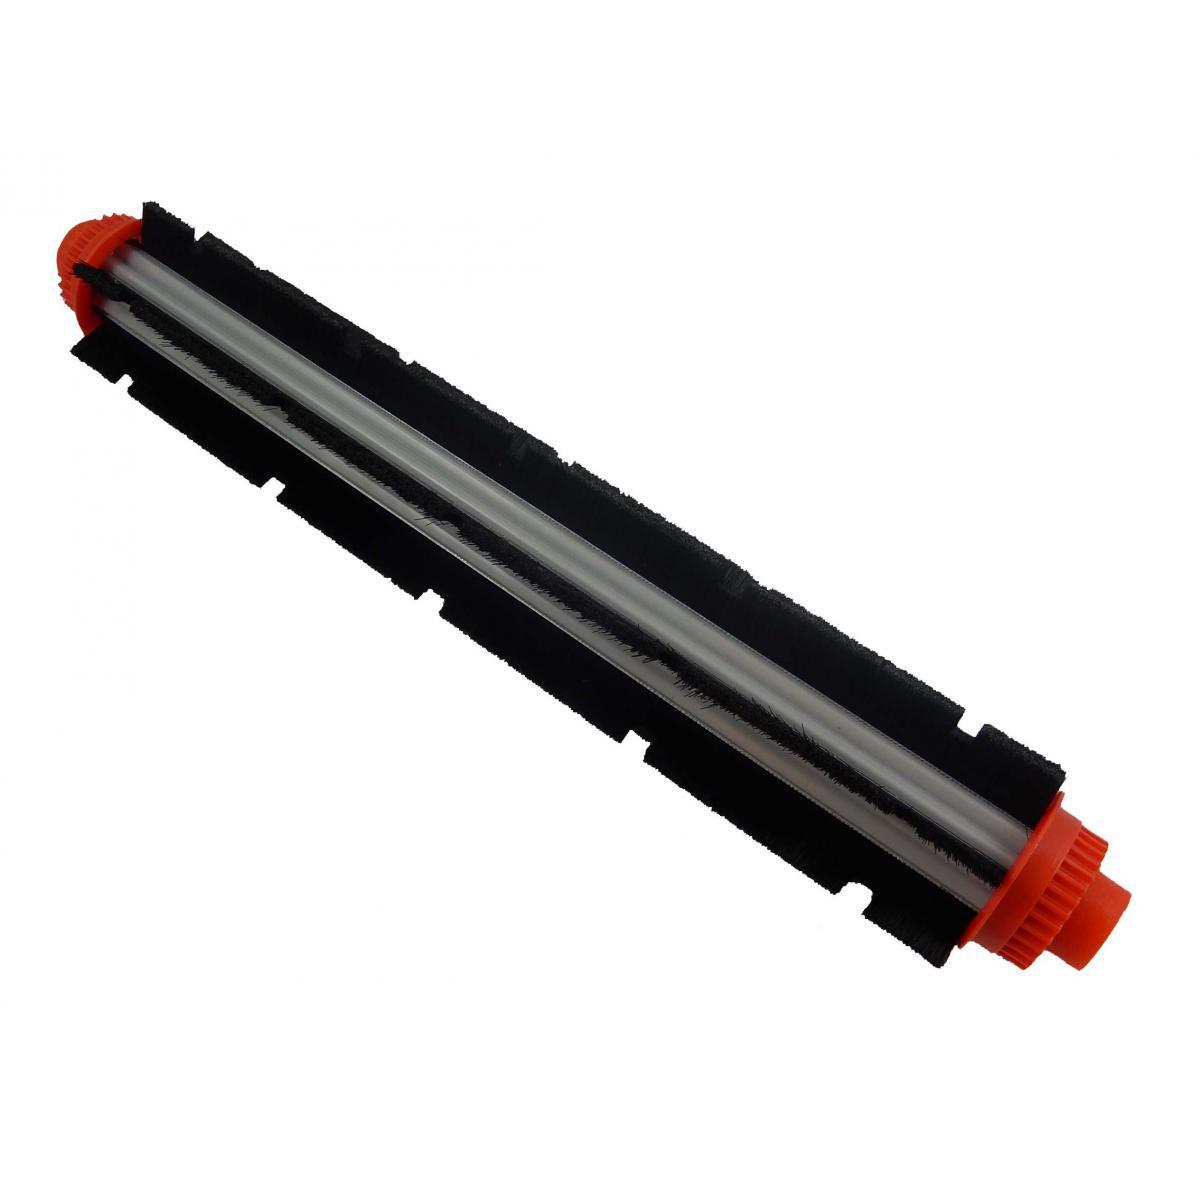 XV25 Vacuum Cleaner Home Cleaner XV-15 4400mAh, 7.4V, Li-Ion vhbw INTENSILO 2x Li-Ion Battery compatible with Neato XV-14 XV-21 XV-25 Signature